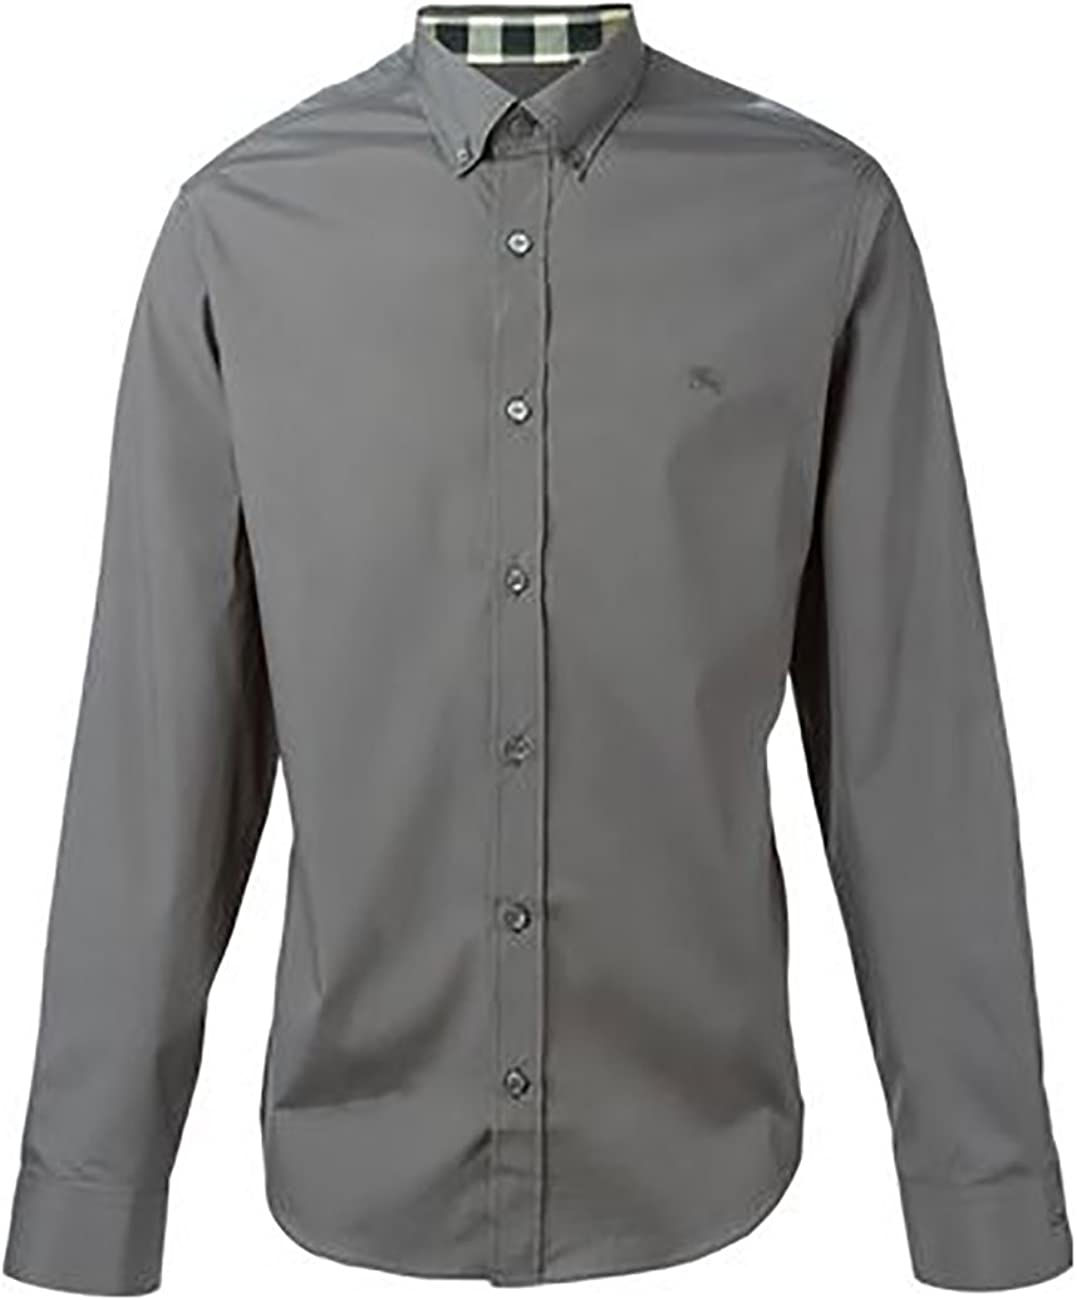 Burberry - Camiseta de manga larga - para hombre gris XXXL: Amazon.es: Ropa y accesorios